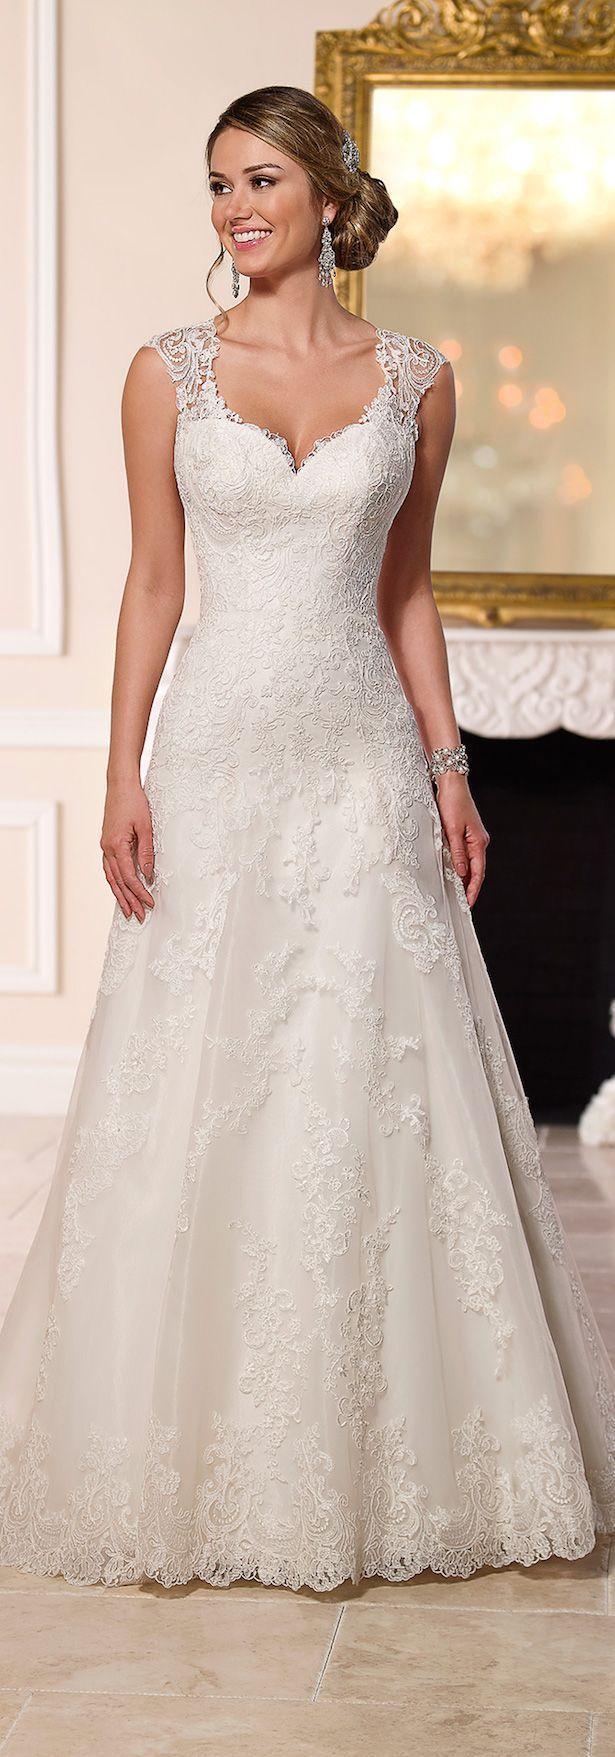 Stella York Spring 2016 Wedding Dress - Belle The Magazine (scheduled via http://www.tailwindapp.com?utm_source=pinterest&utm_medium=twpin&utm_content=post27084990&utm_campaign=scheduler_attribution)